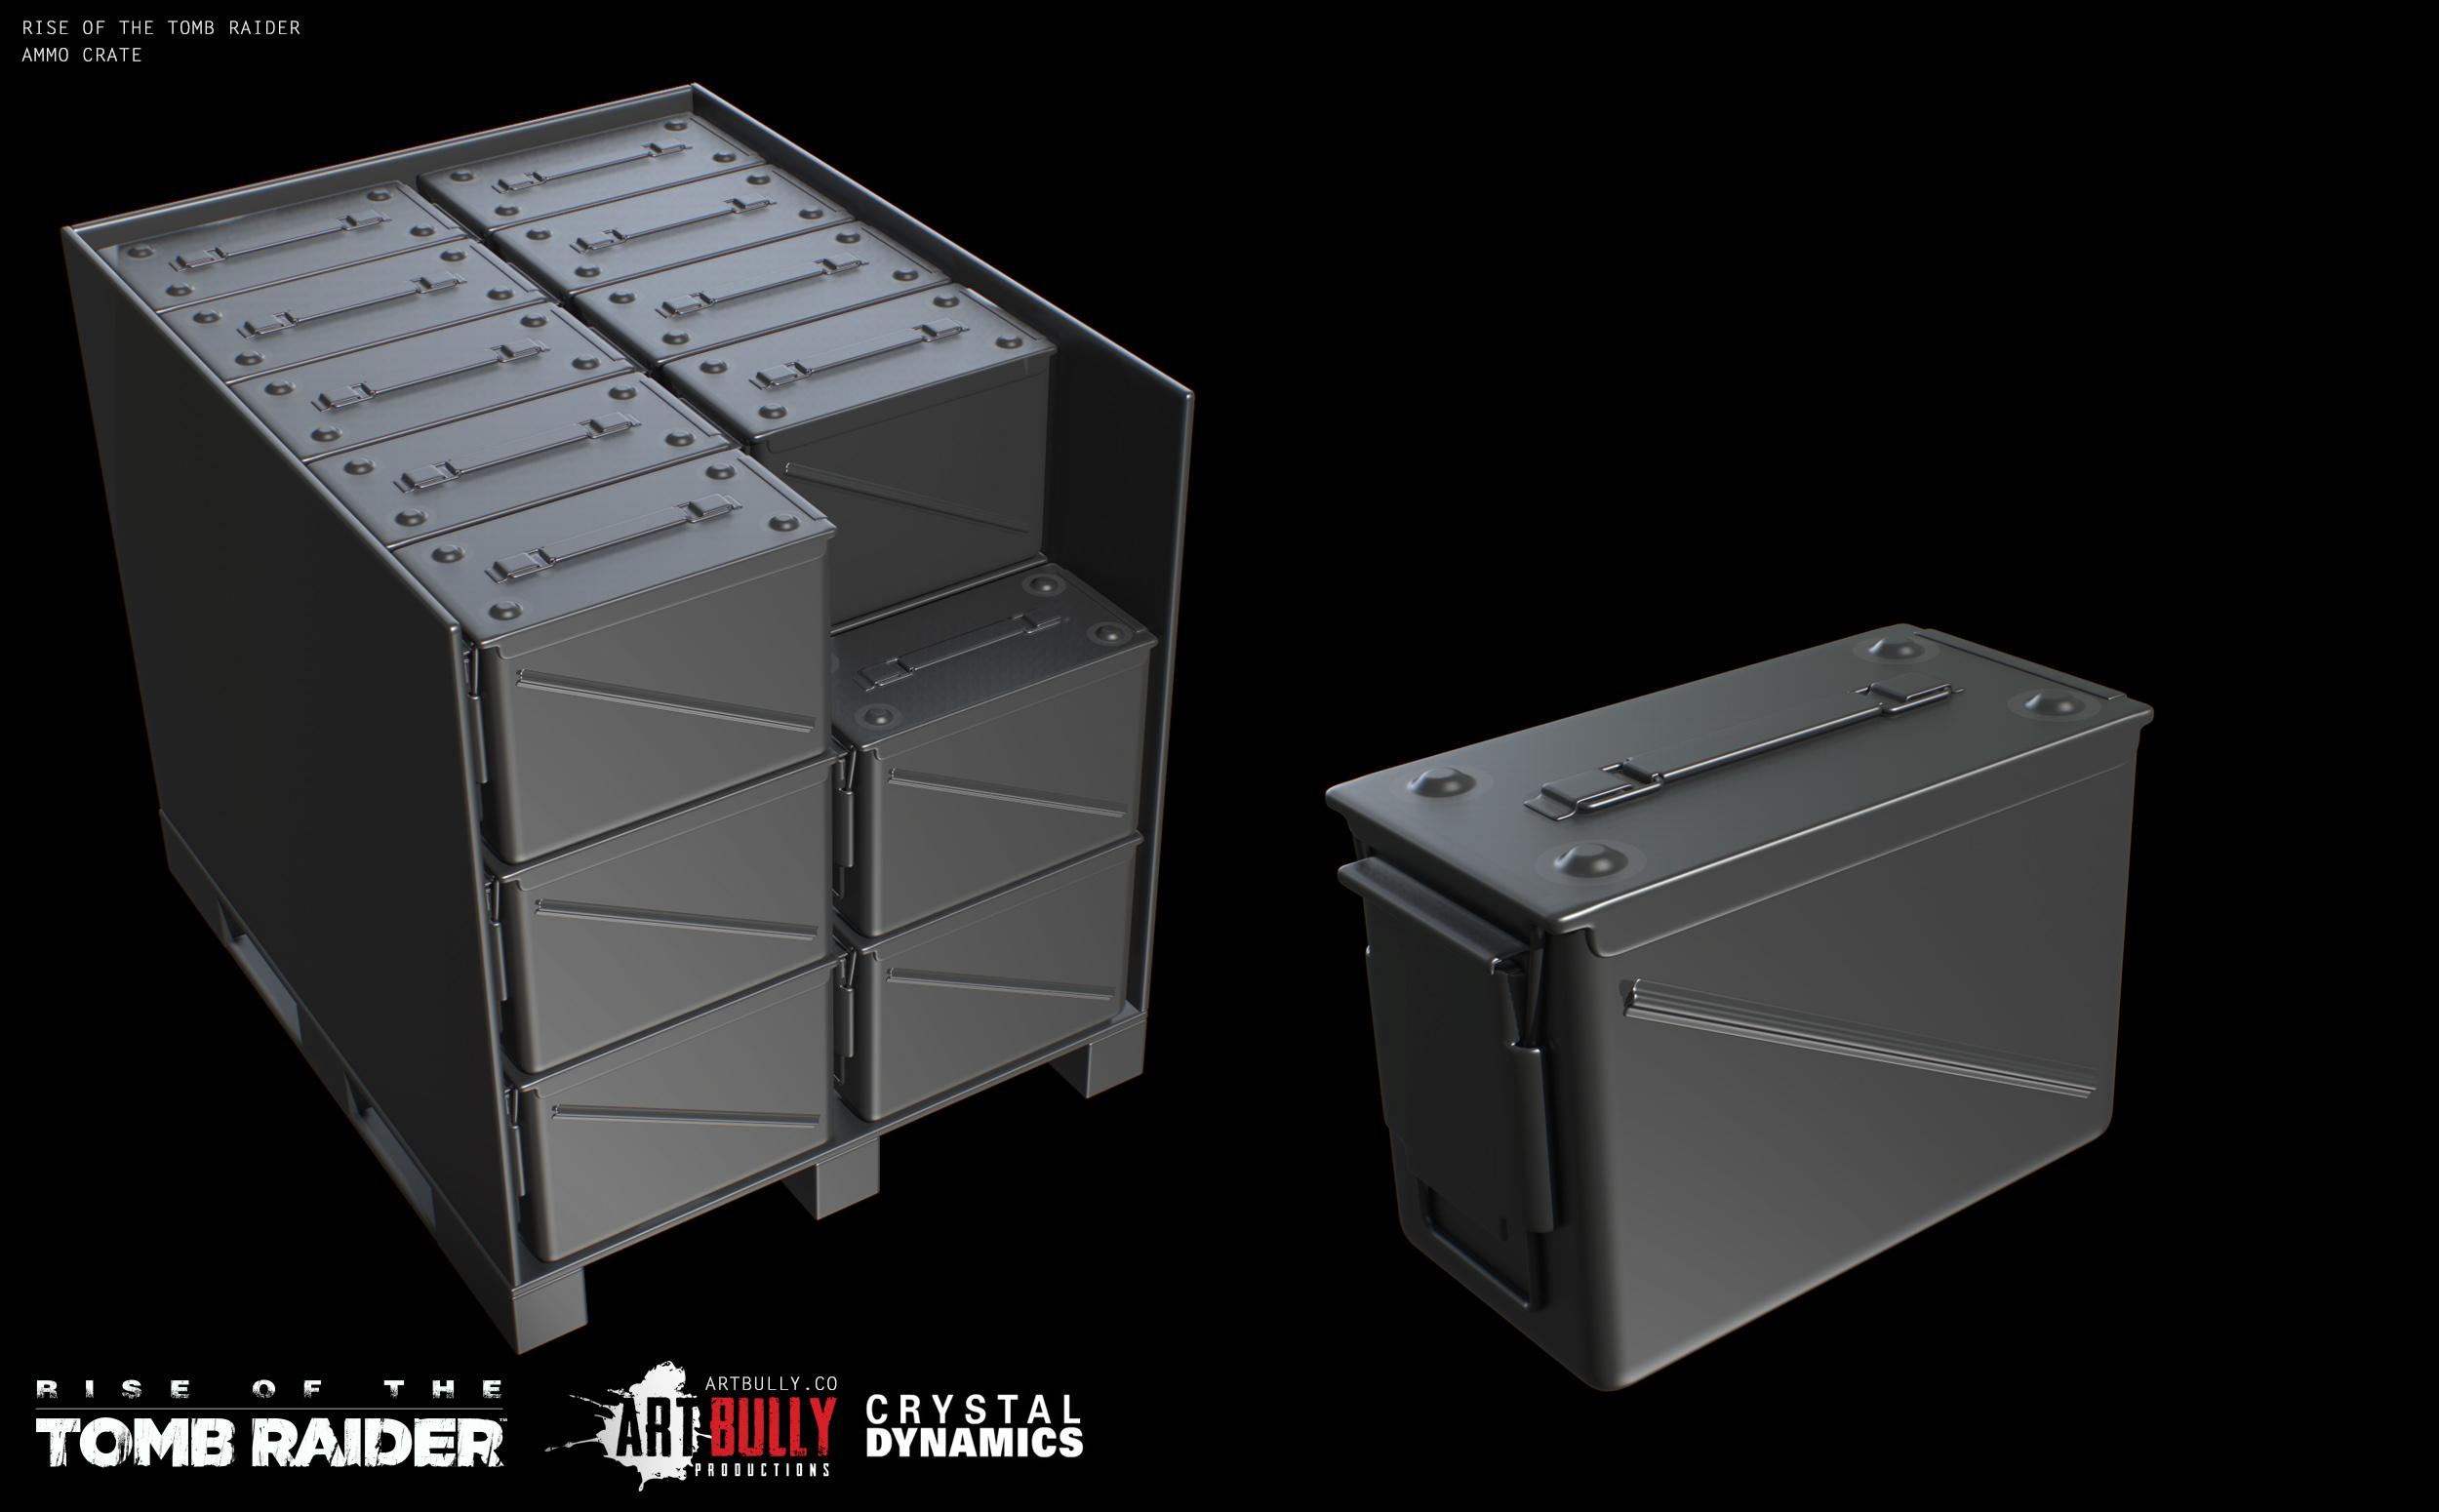 Ammo_crate copy.jpg